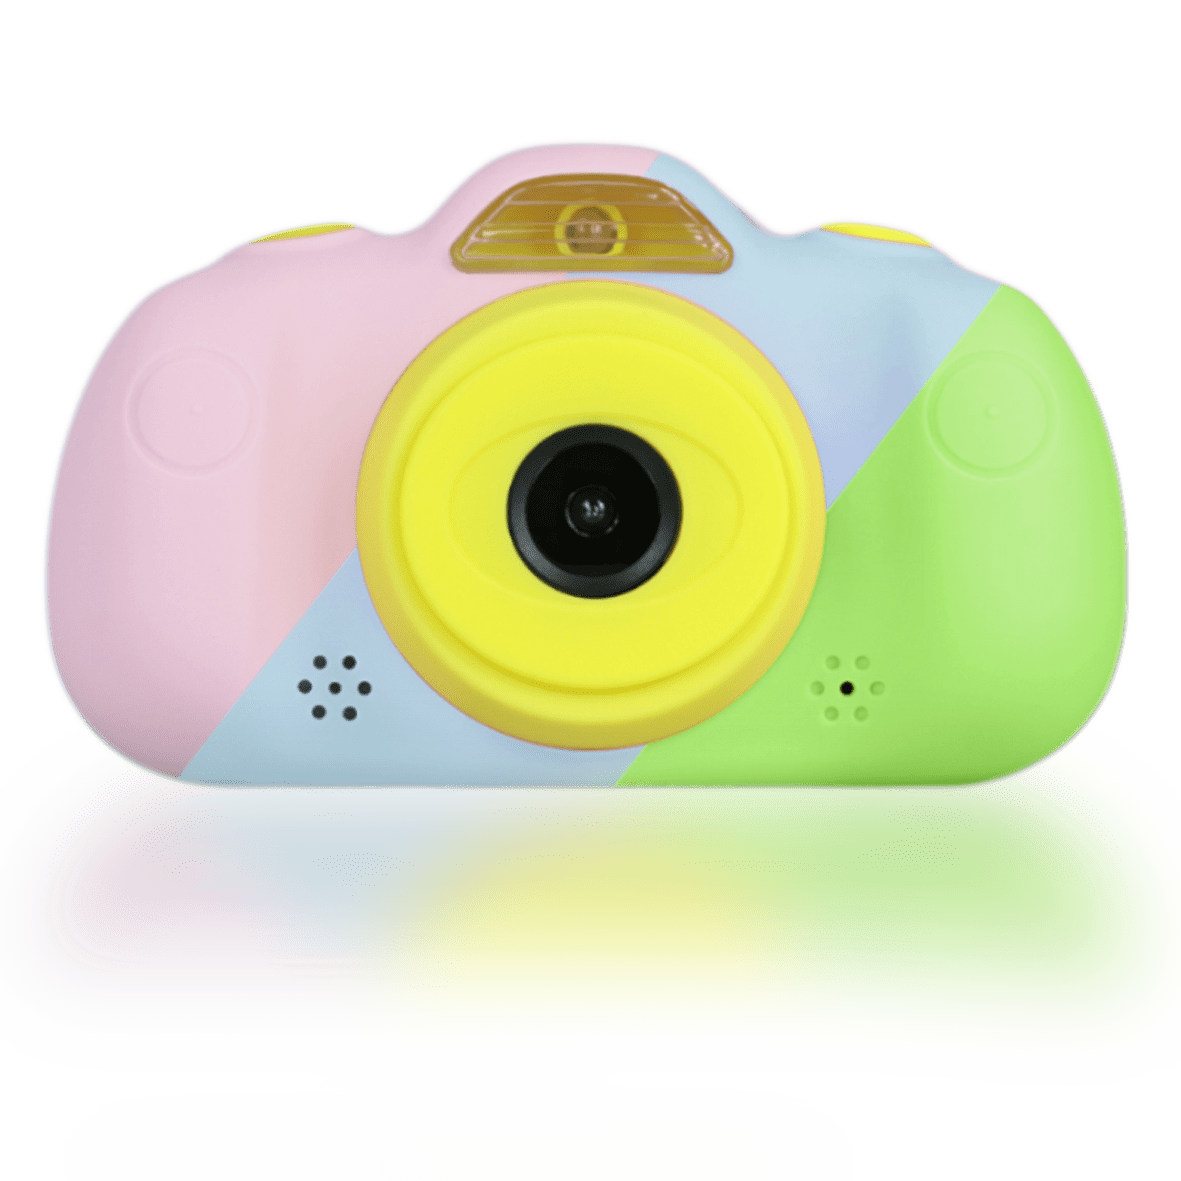 camara de fotos para niños rosa azul verde savefamily